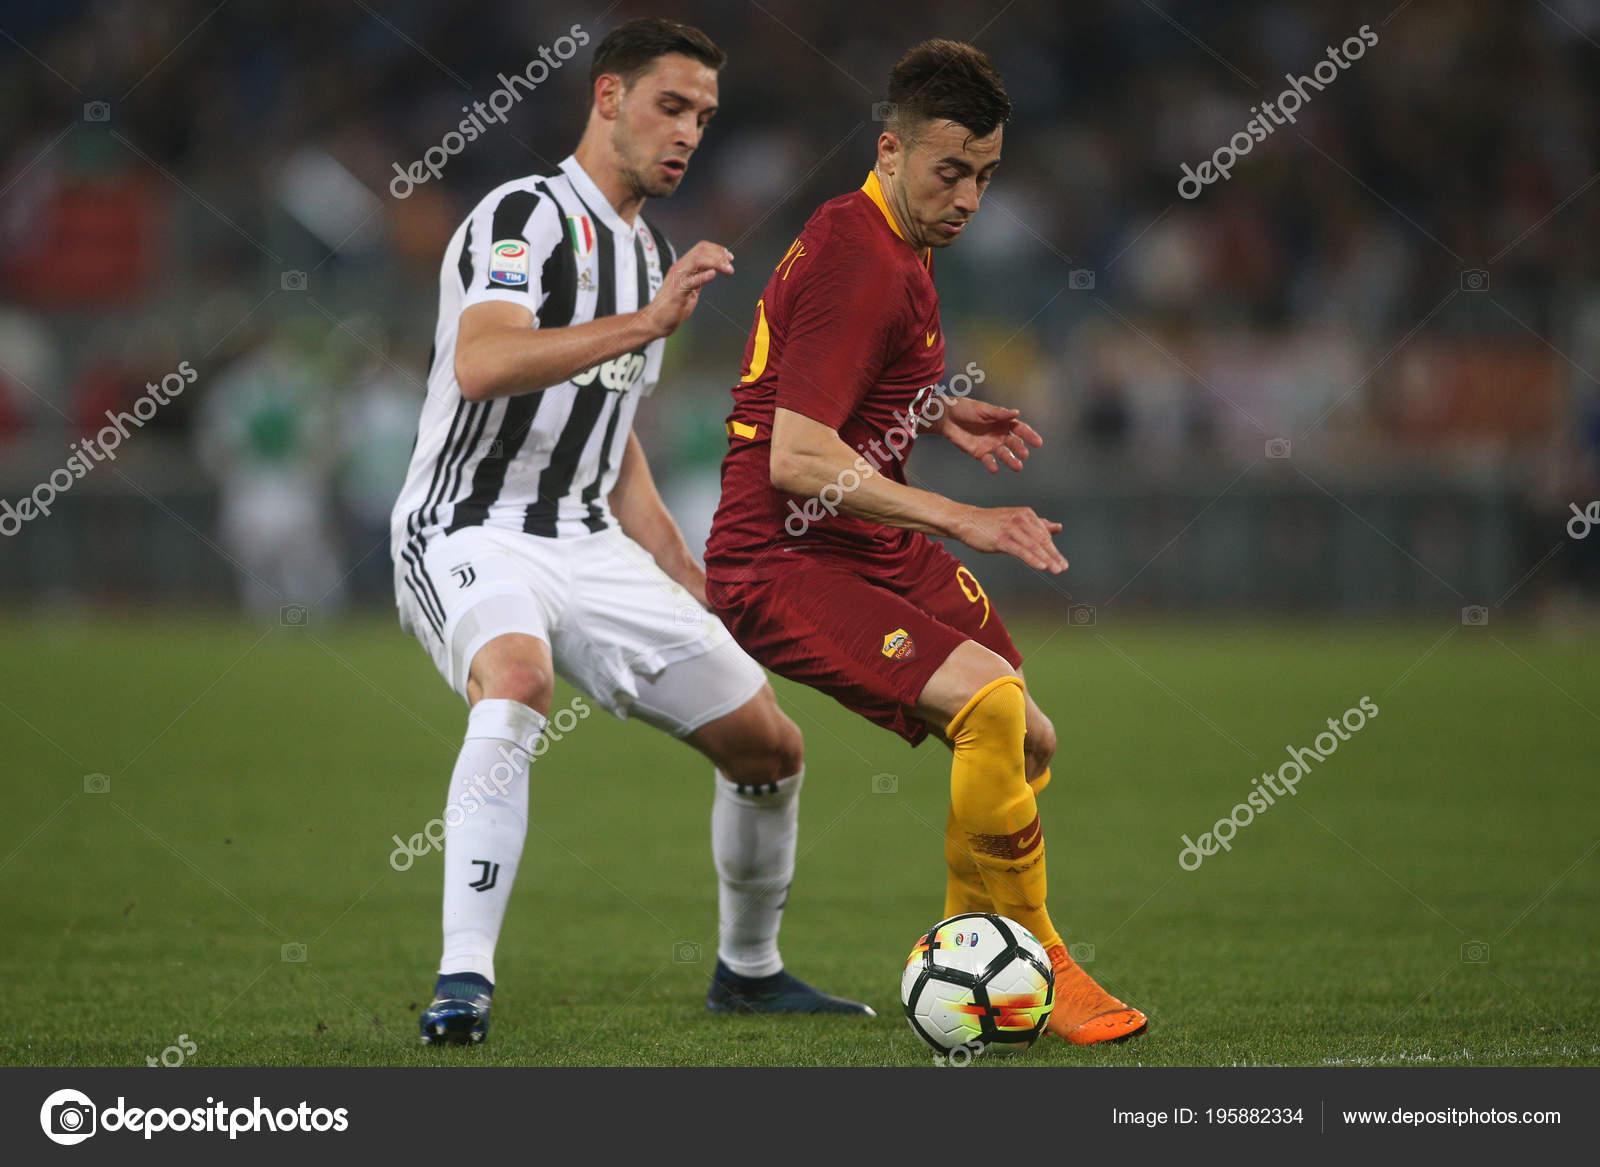 2018 Stadio Olimpico Rome Italy Serie Roma Juventus Sciglio Shaarawy